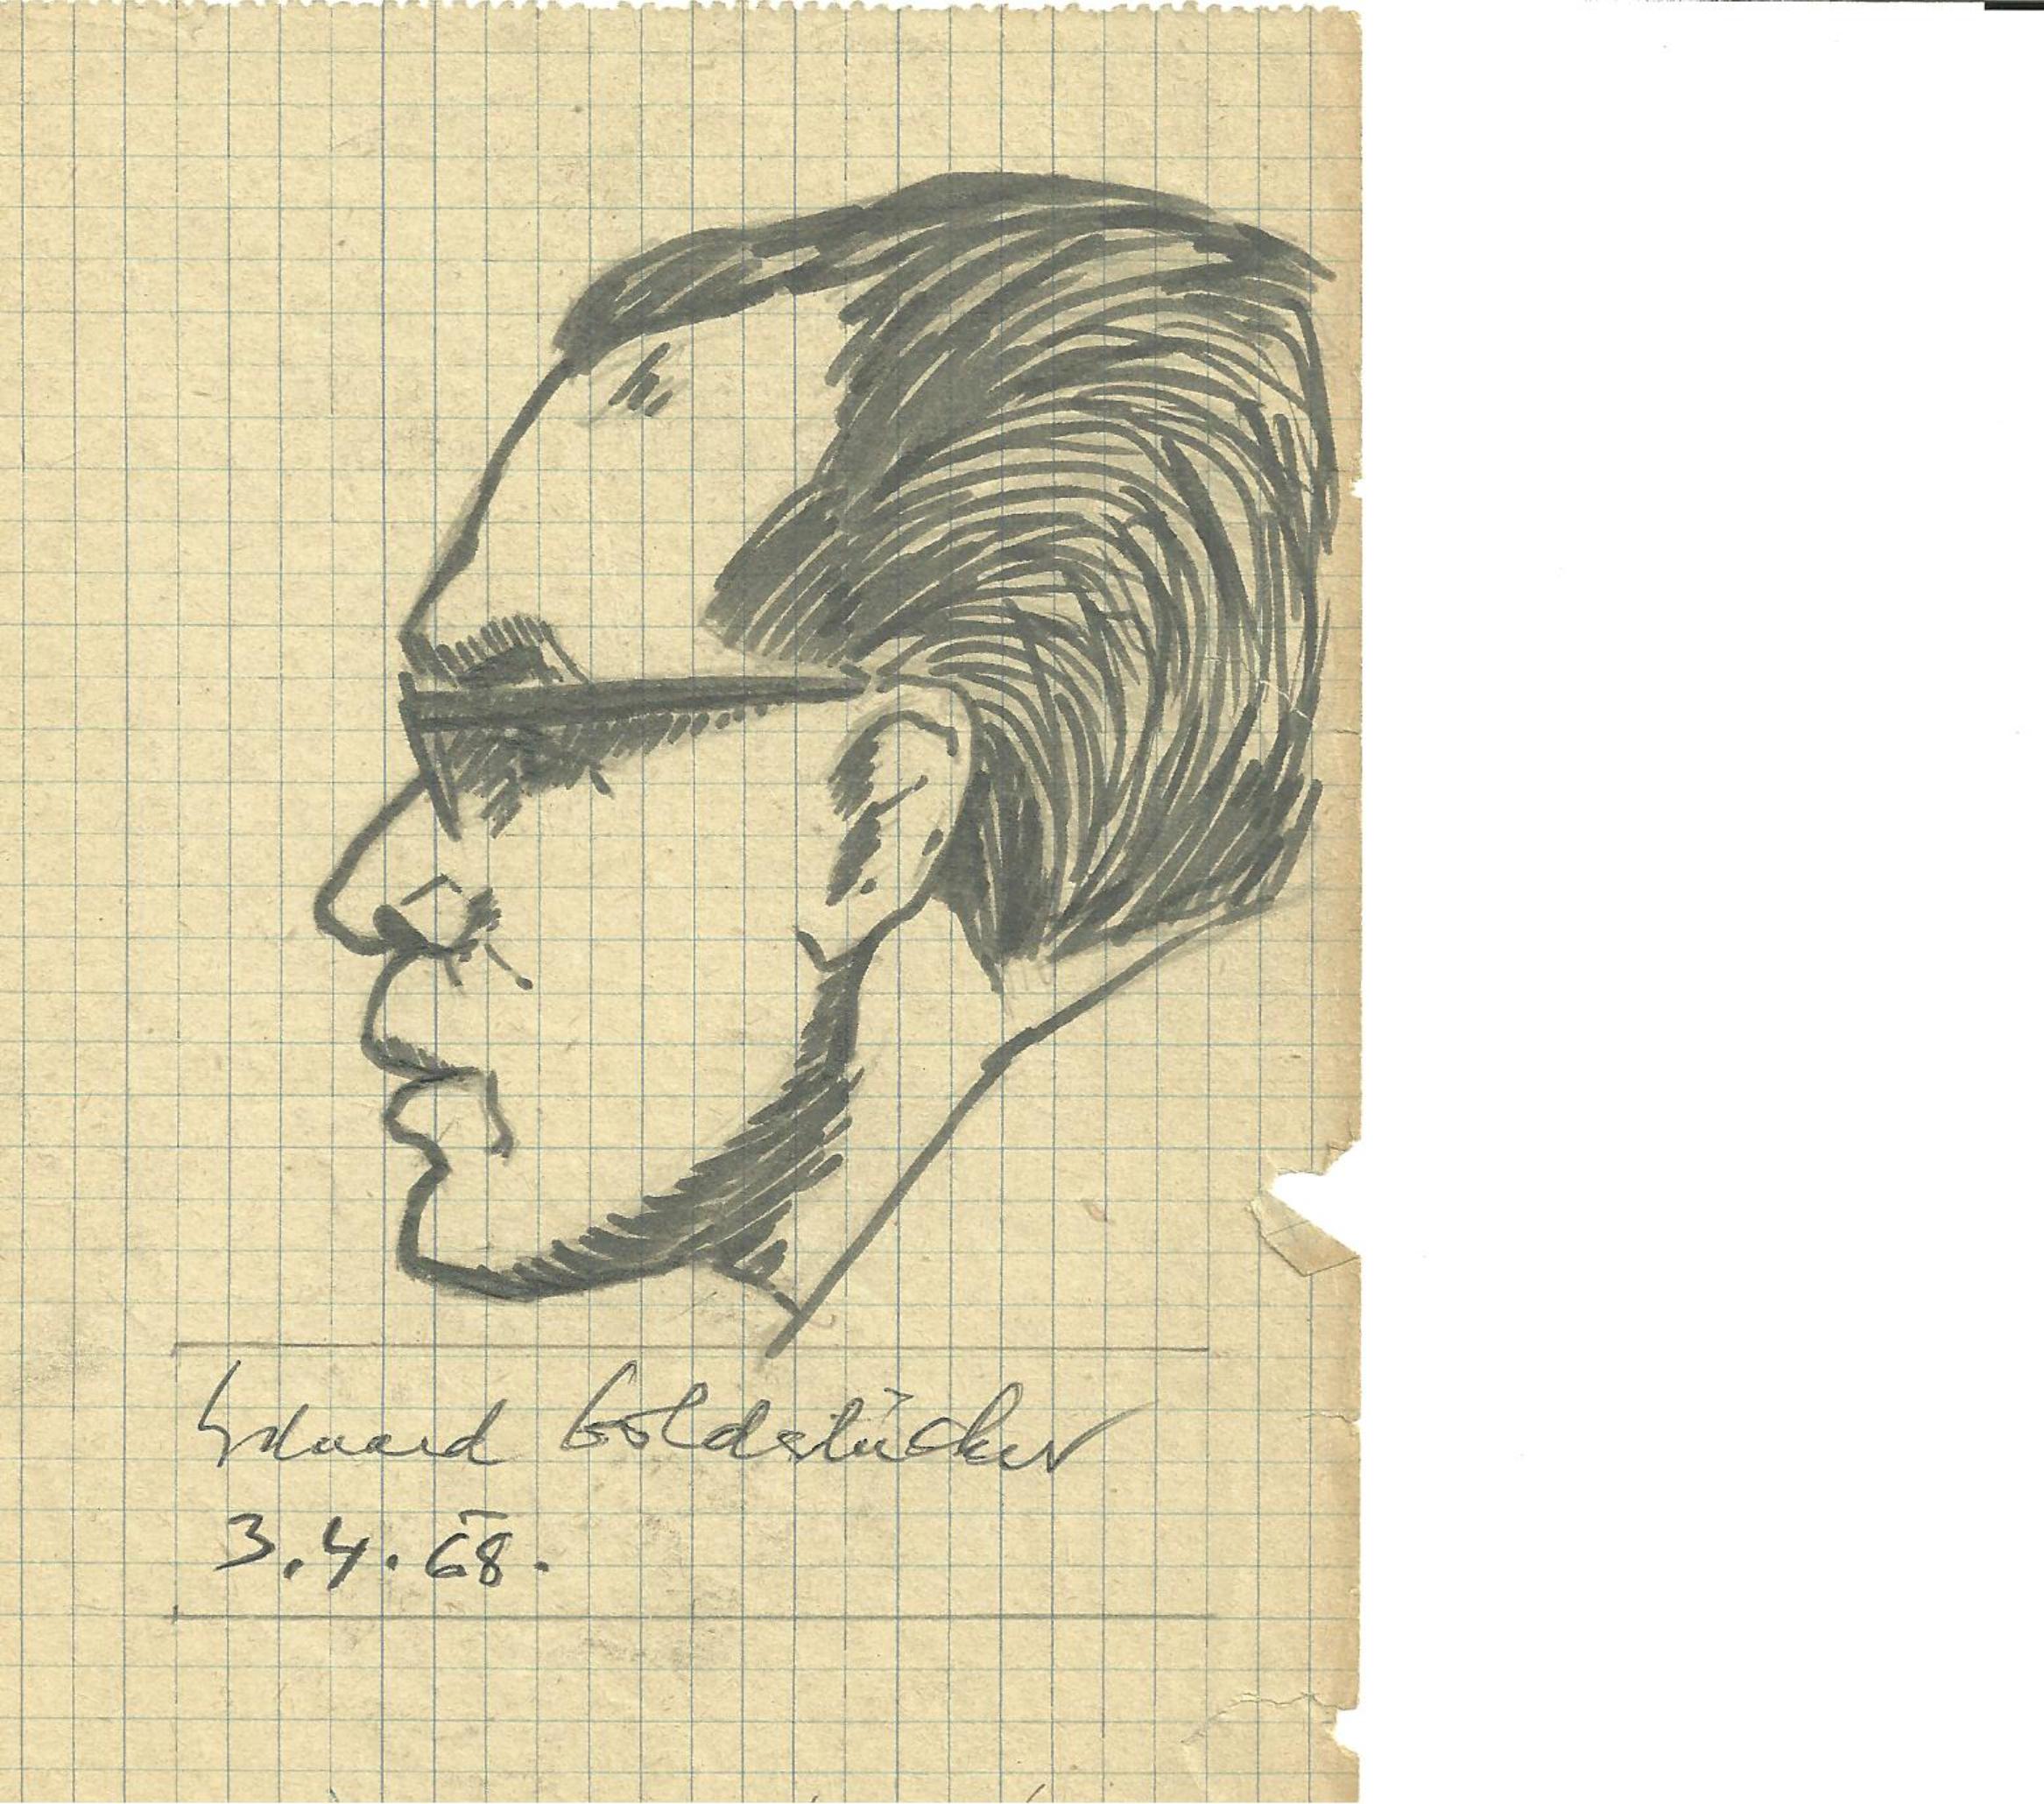 Politik Eduard Goldstucker